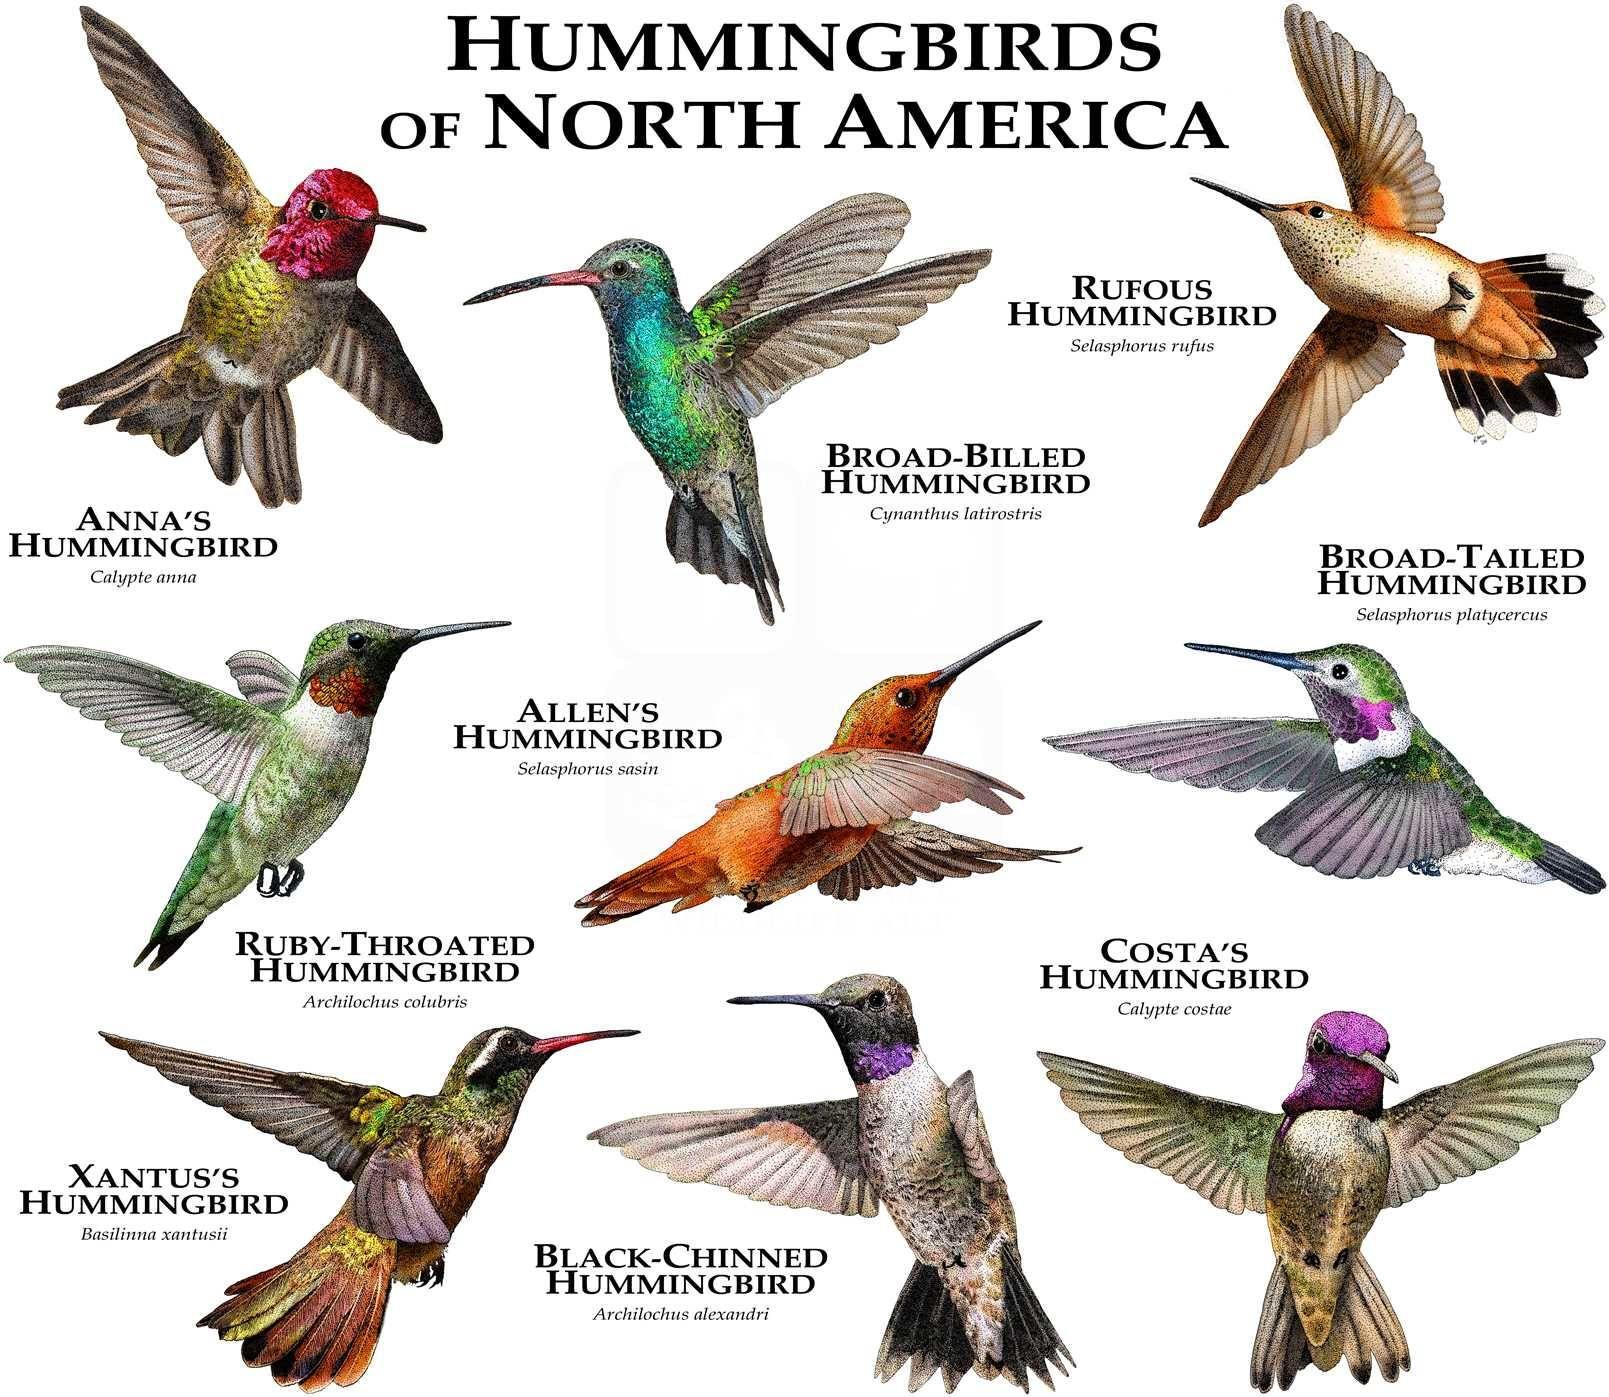 Hummingbirds Of North America Poster Print 美しい鳥 鳥の写真 鳥 かわいい